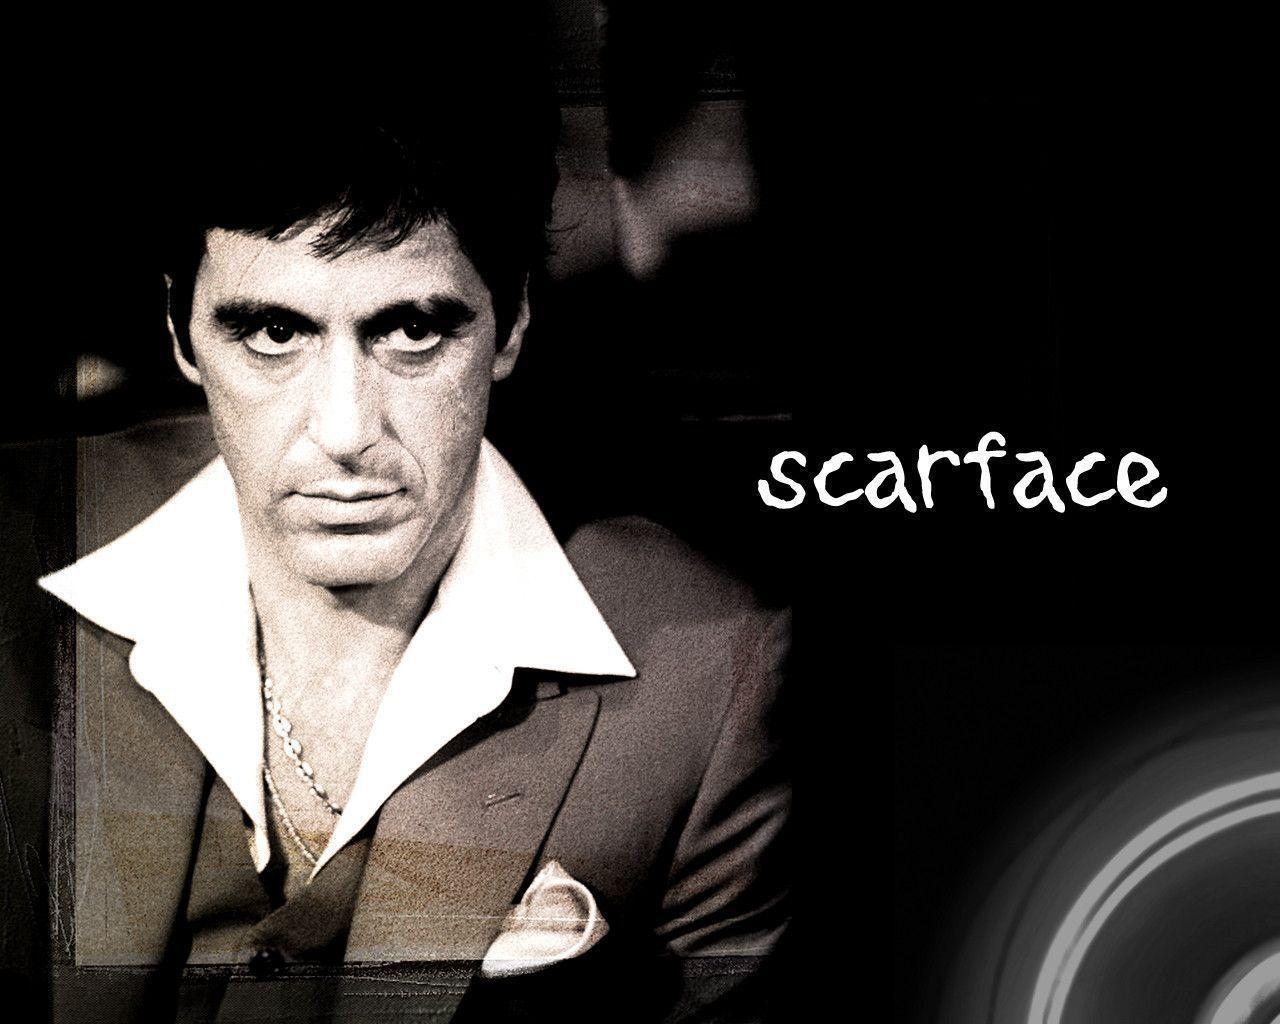 Scarface desktop wallpaper wallpapersafari - Scarface background ...